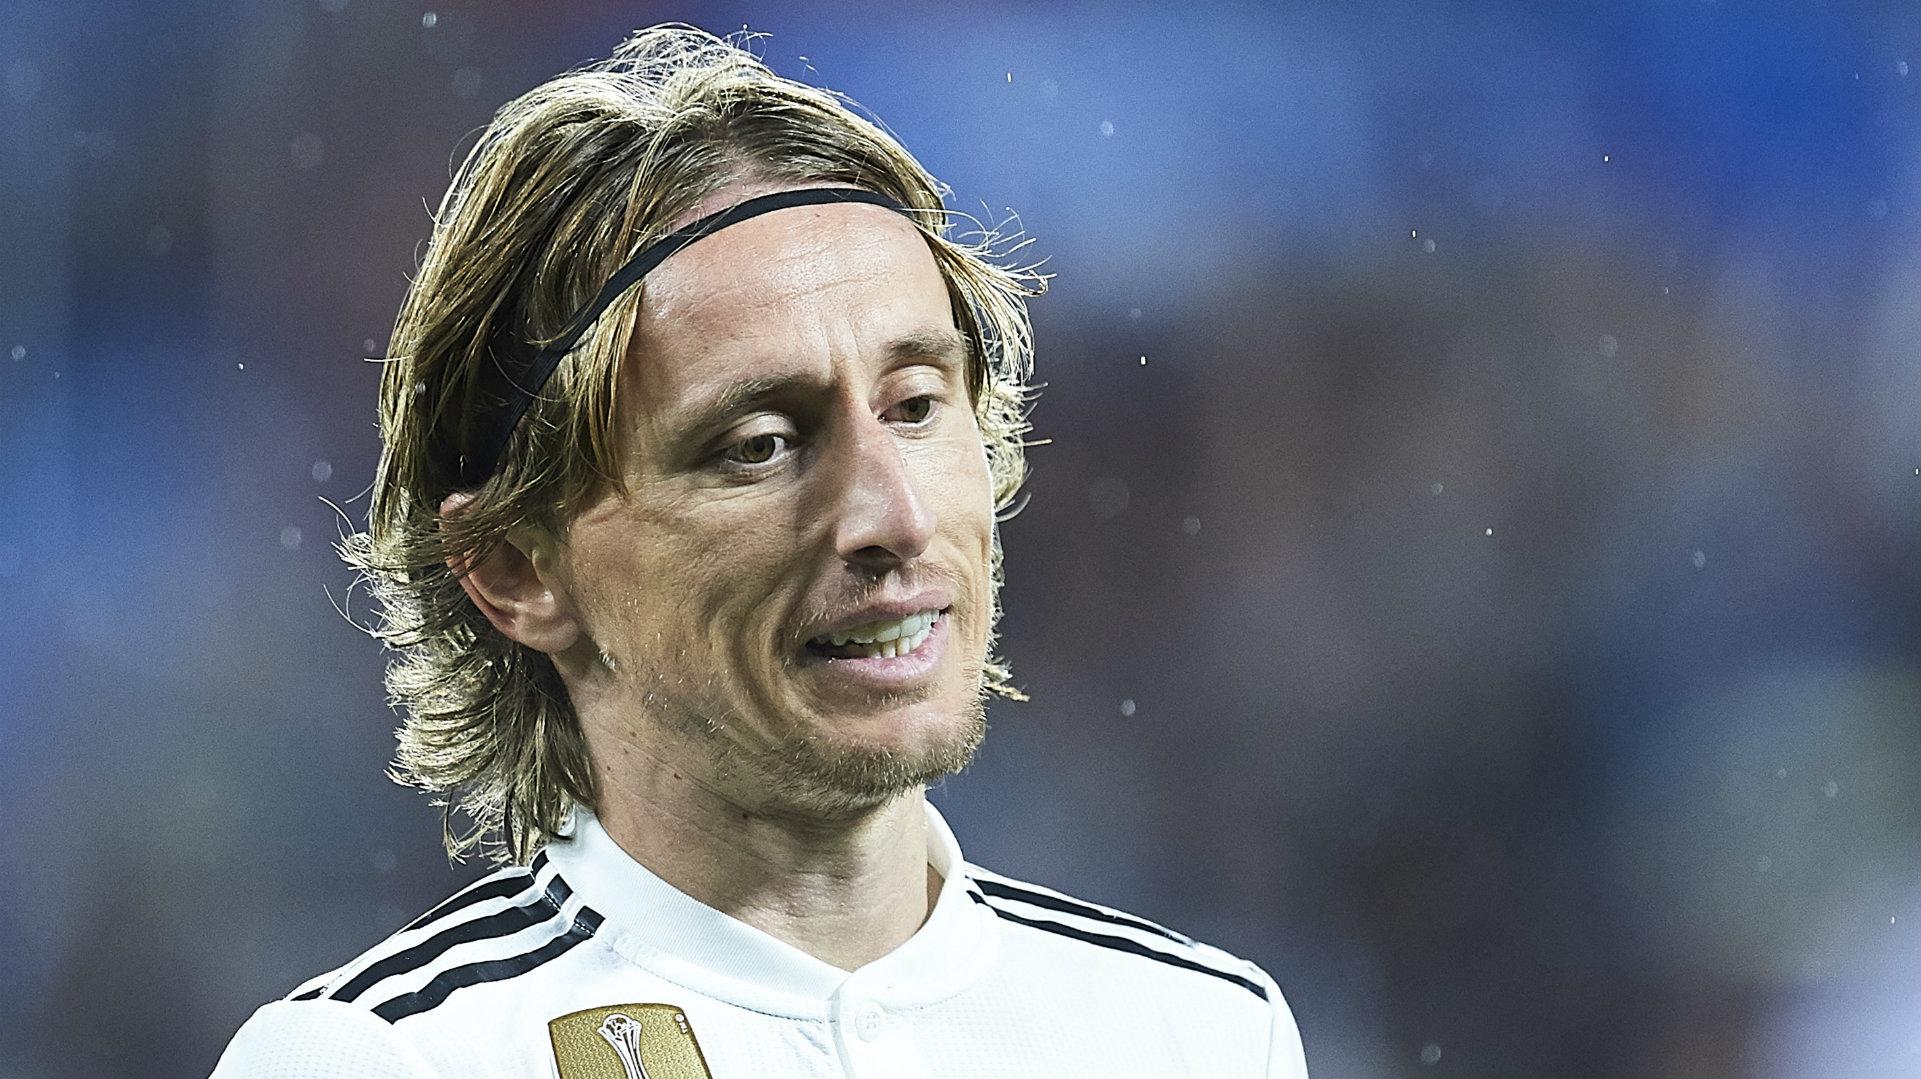 Luka Modric Transfer News Real Madrid Stars Move To Inter Is Fantasy Football Says Man City Boss Pep Guardiola Goal Com